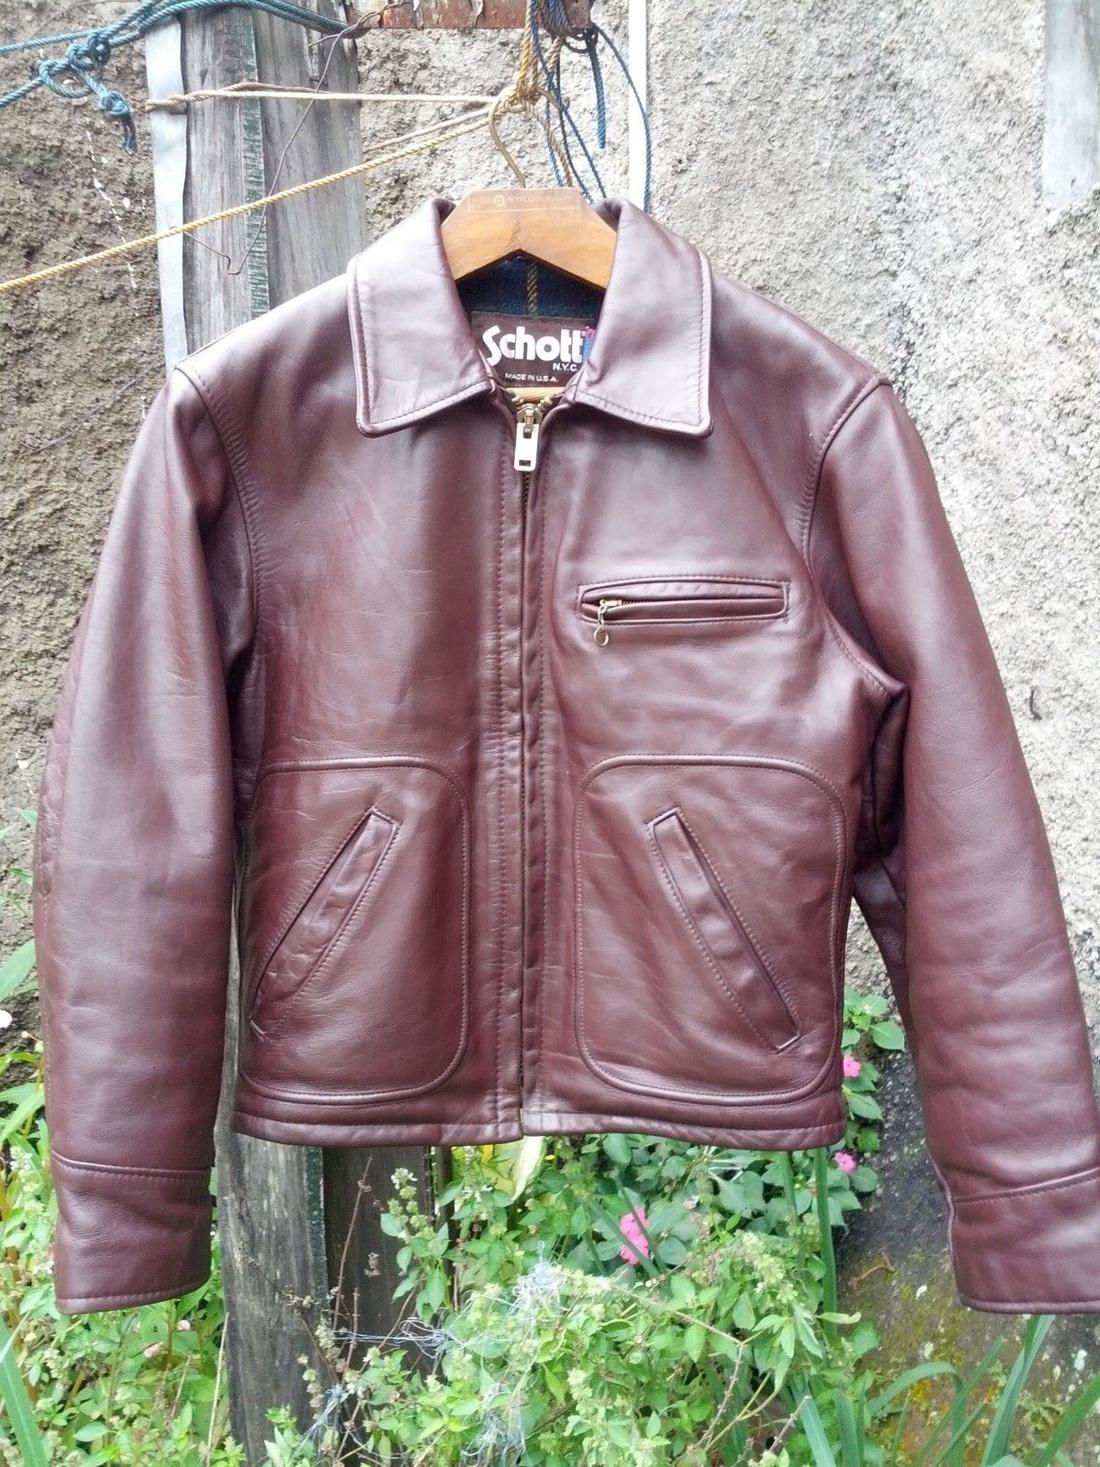 Schott SCHOTT 658 Leather Jacket Size US S / EU 44-46 / 1